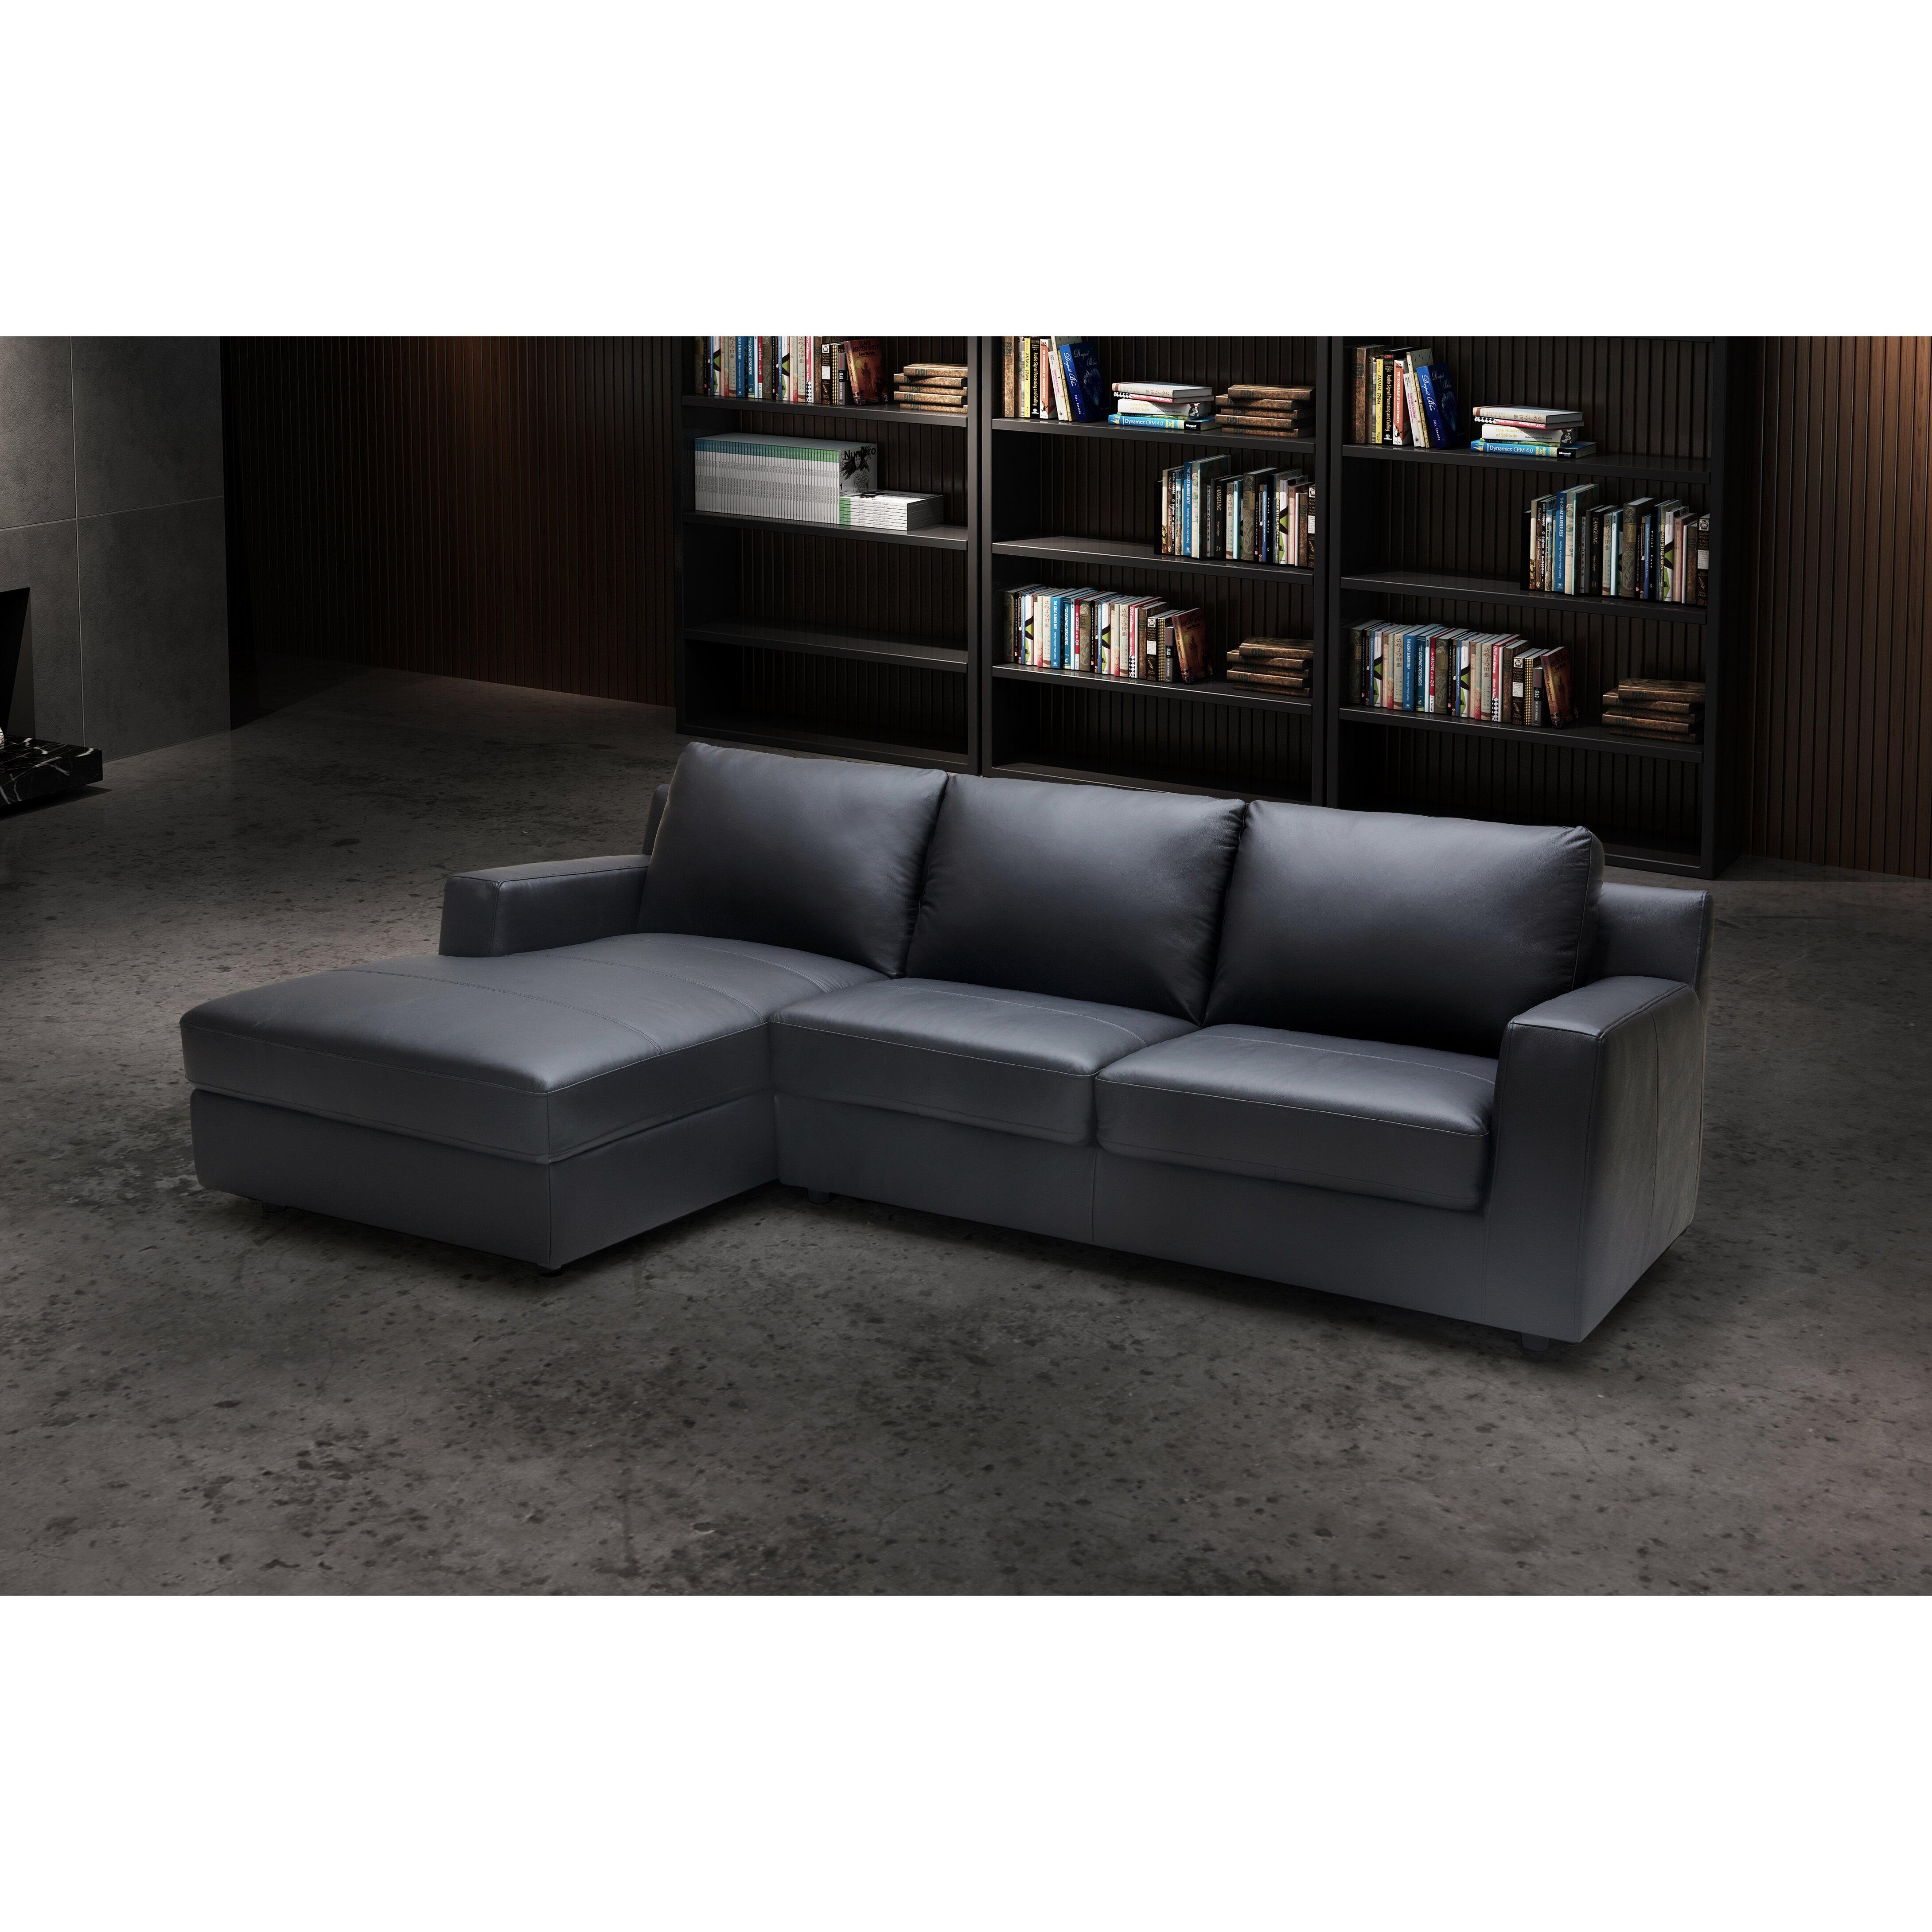 J M Furniture Sleeper Sectional Reviews Wayfair